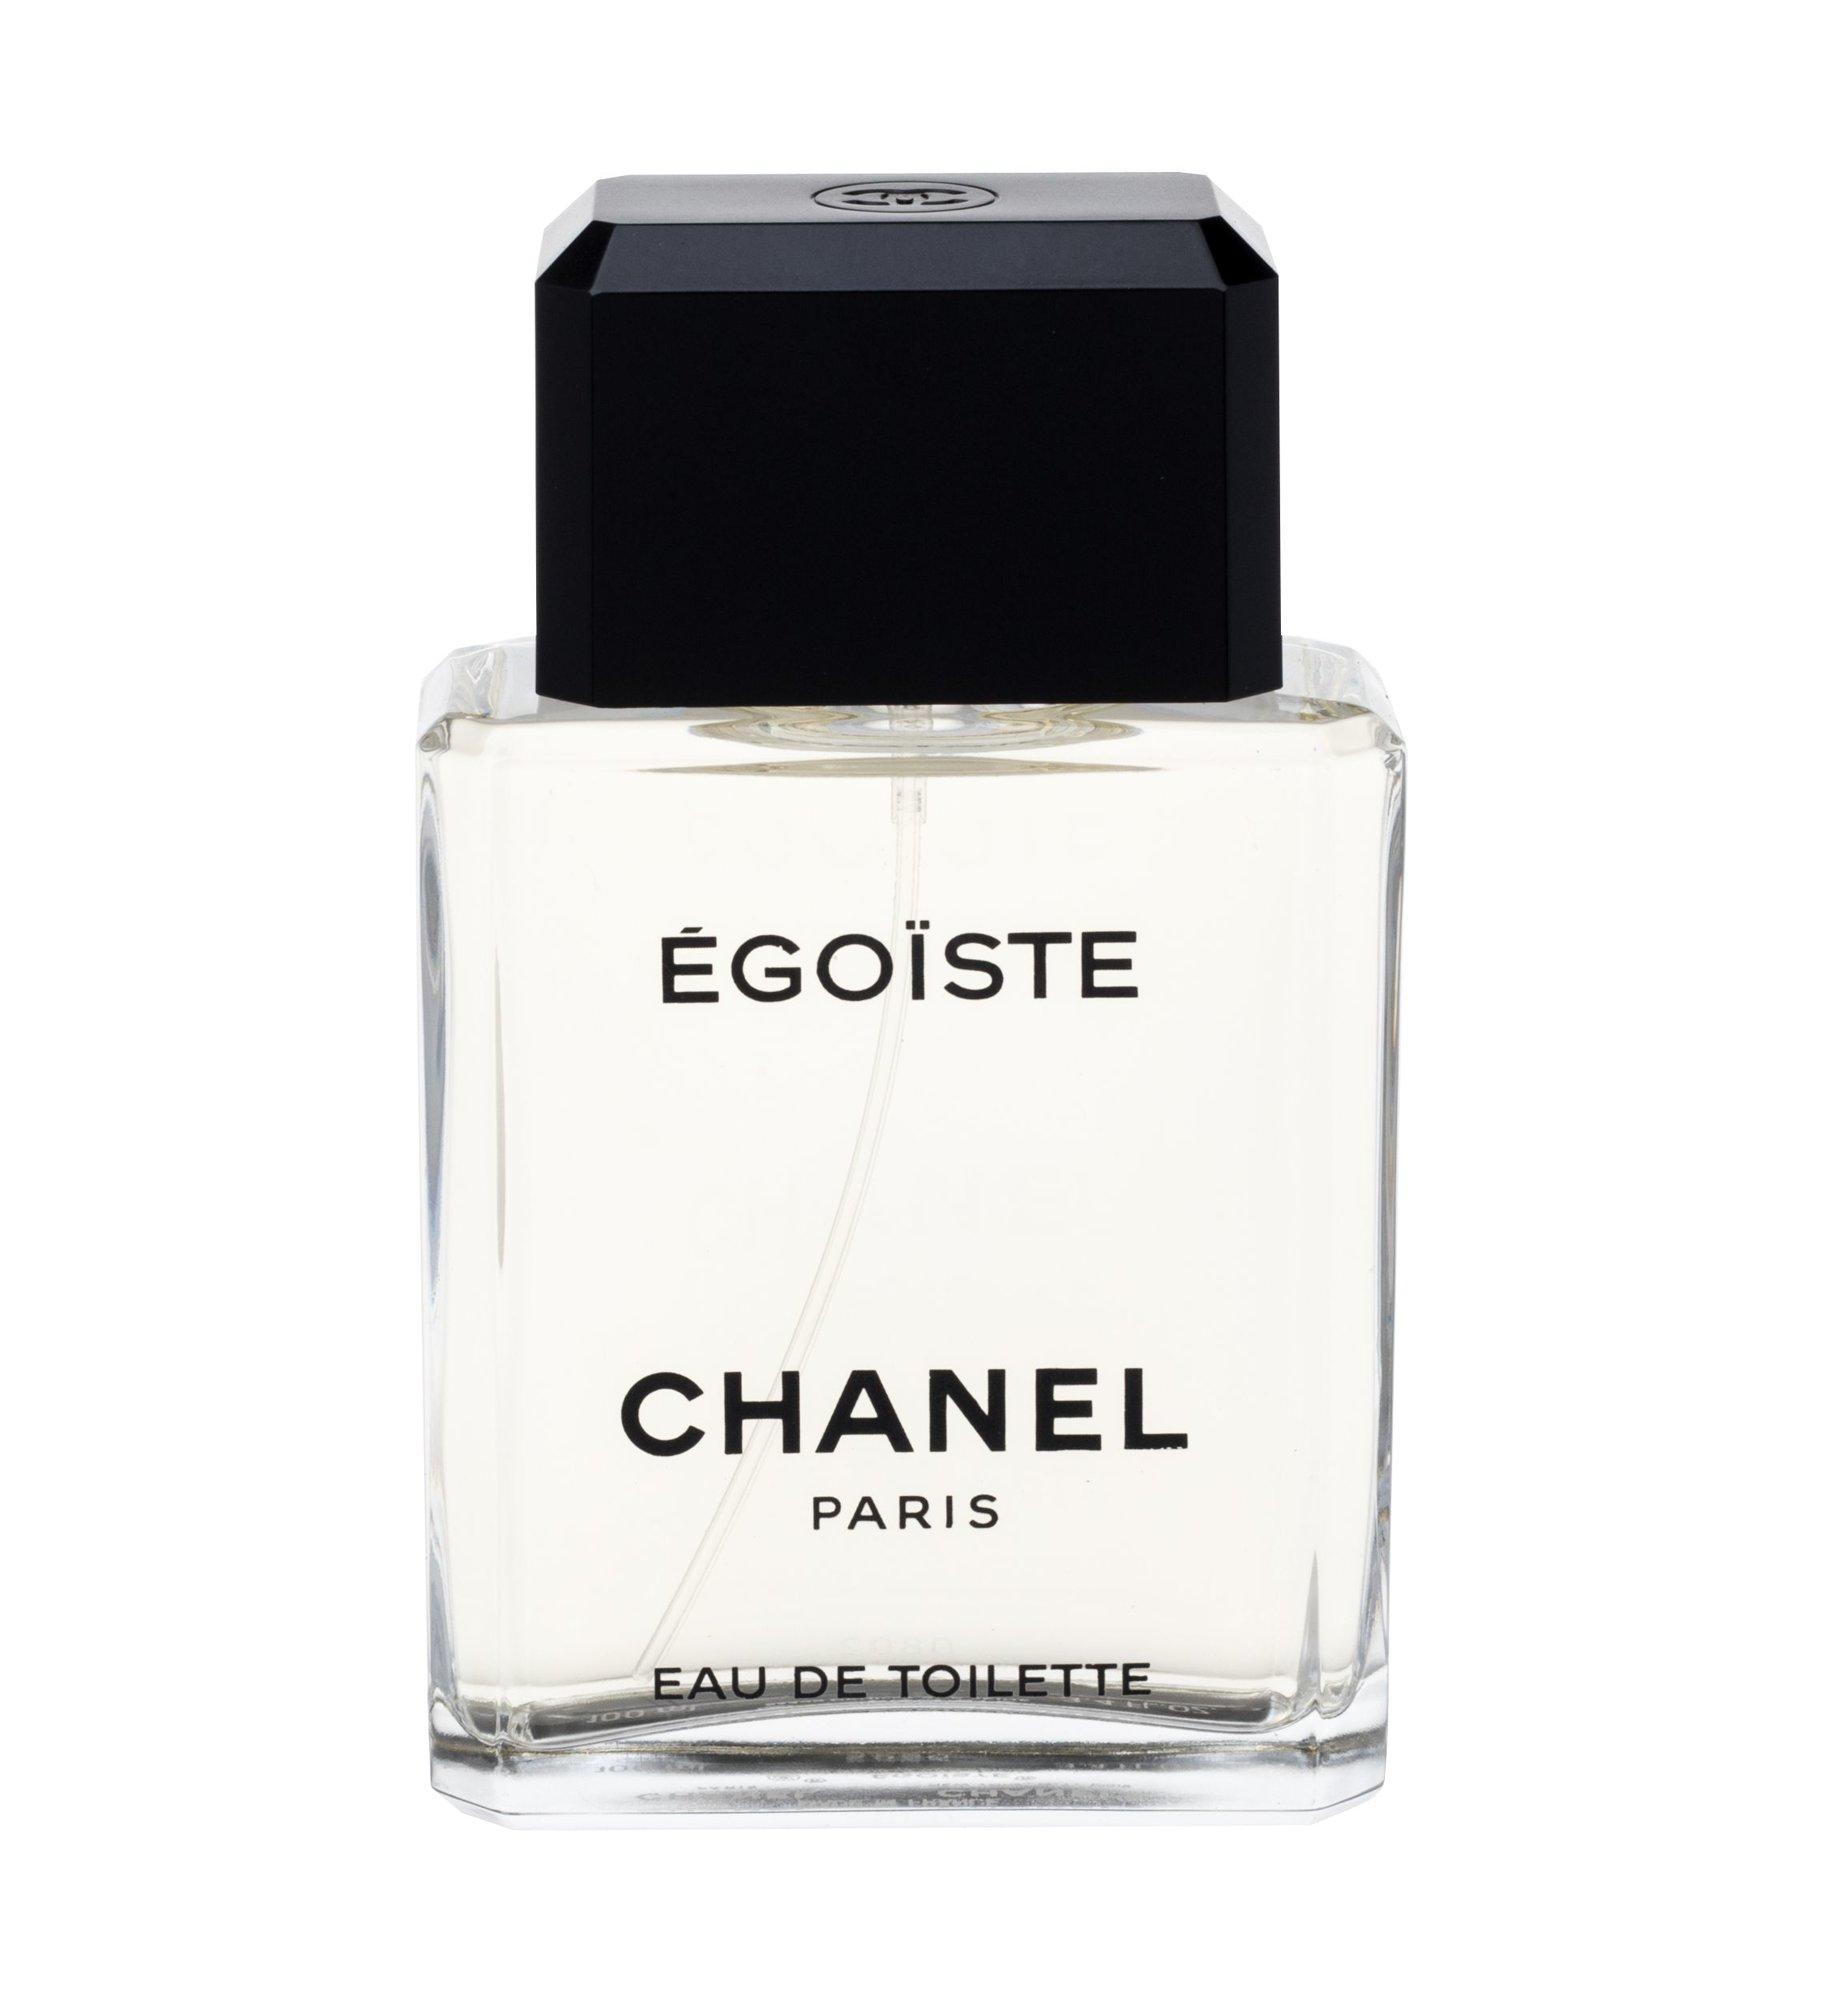 Chanel Egoiste Pour Homme EDT 100ml